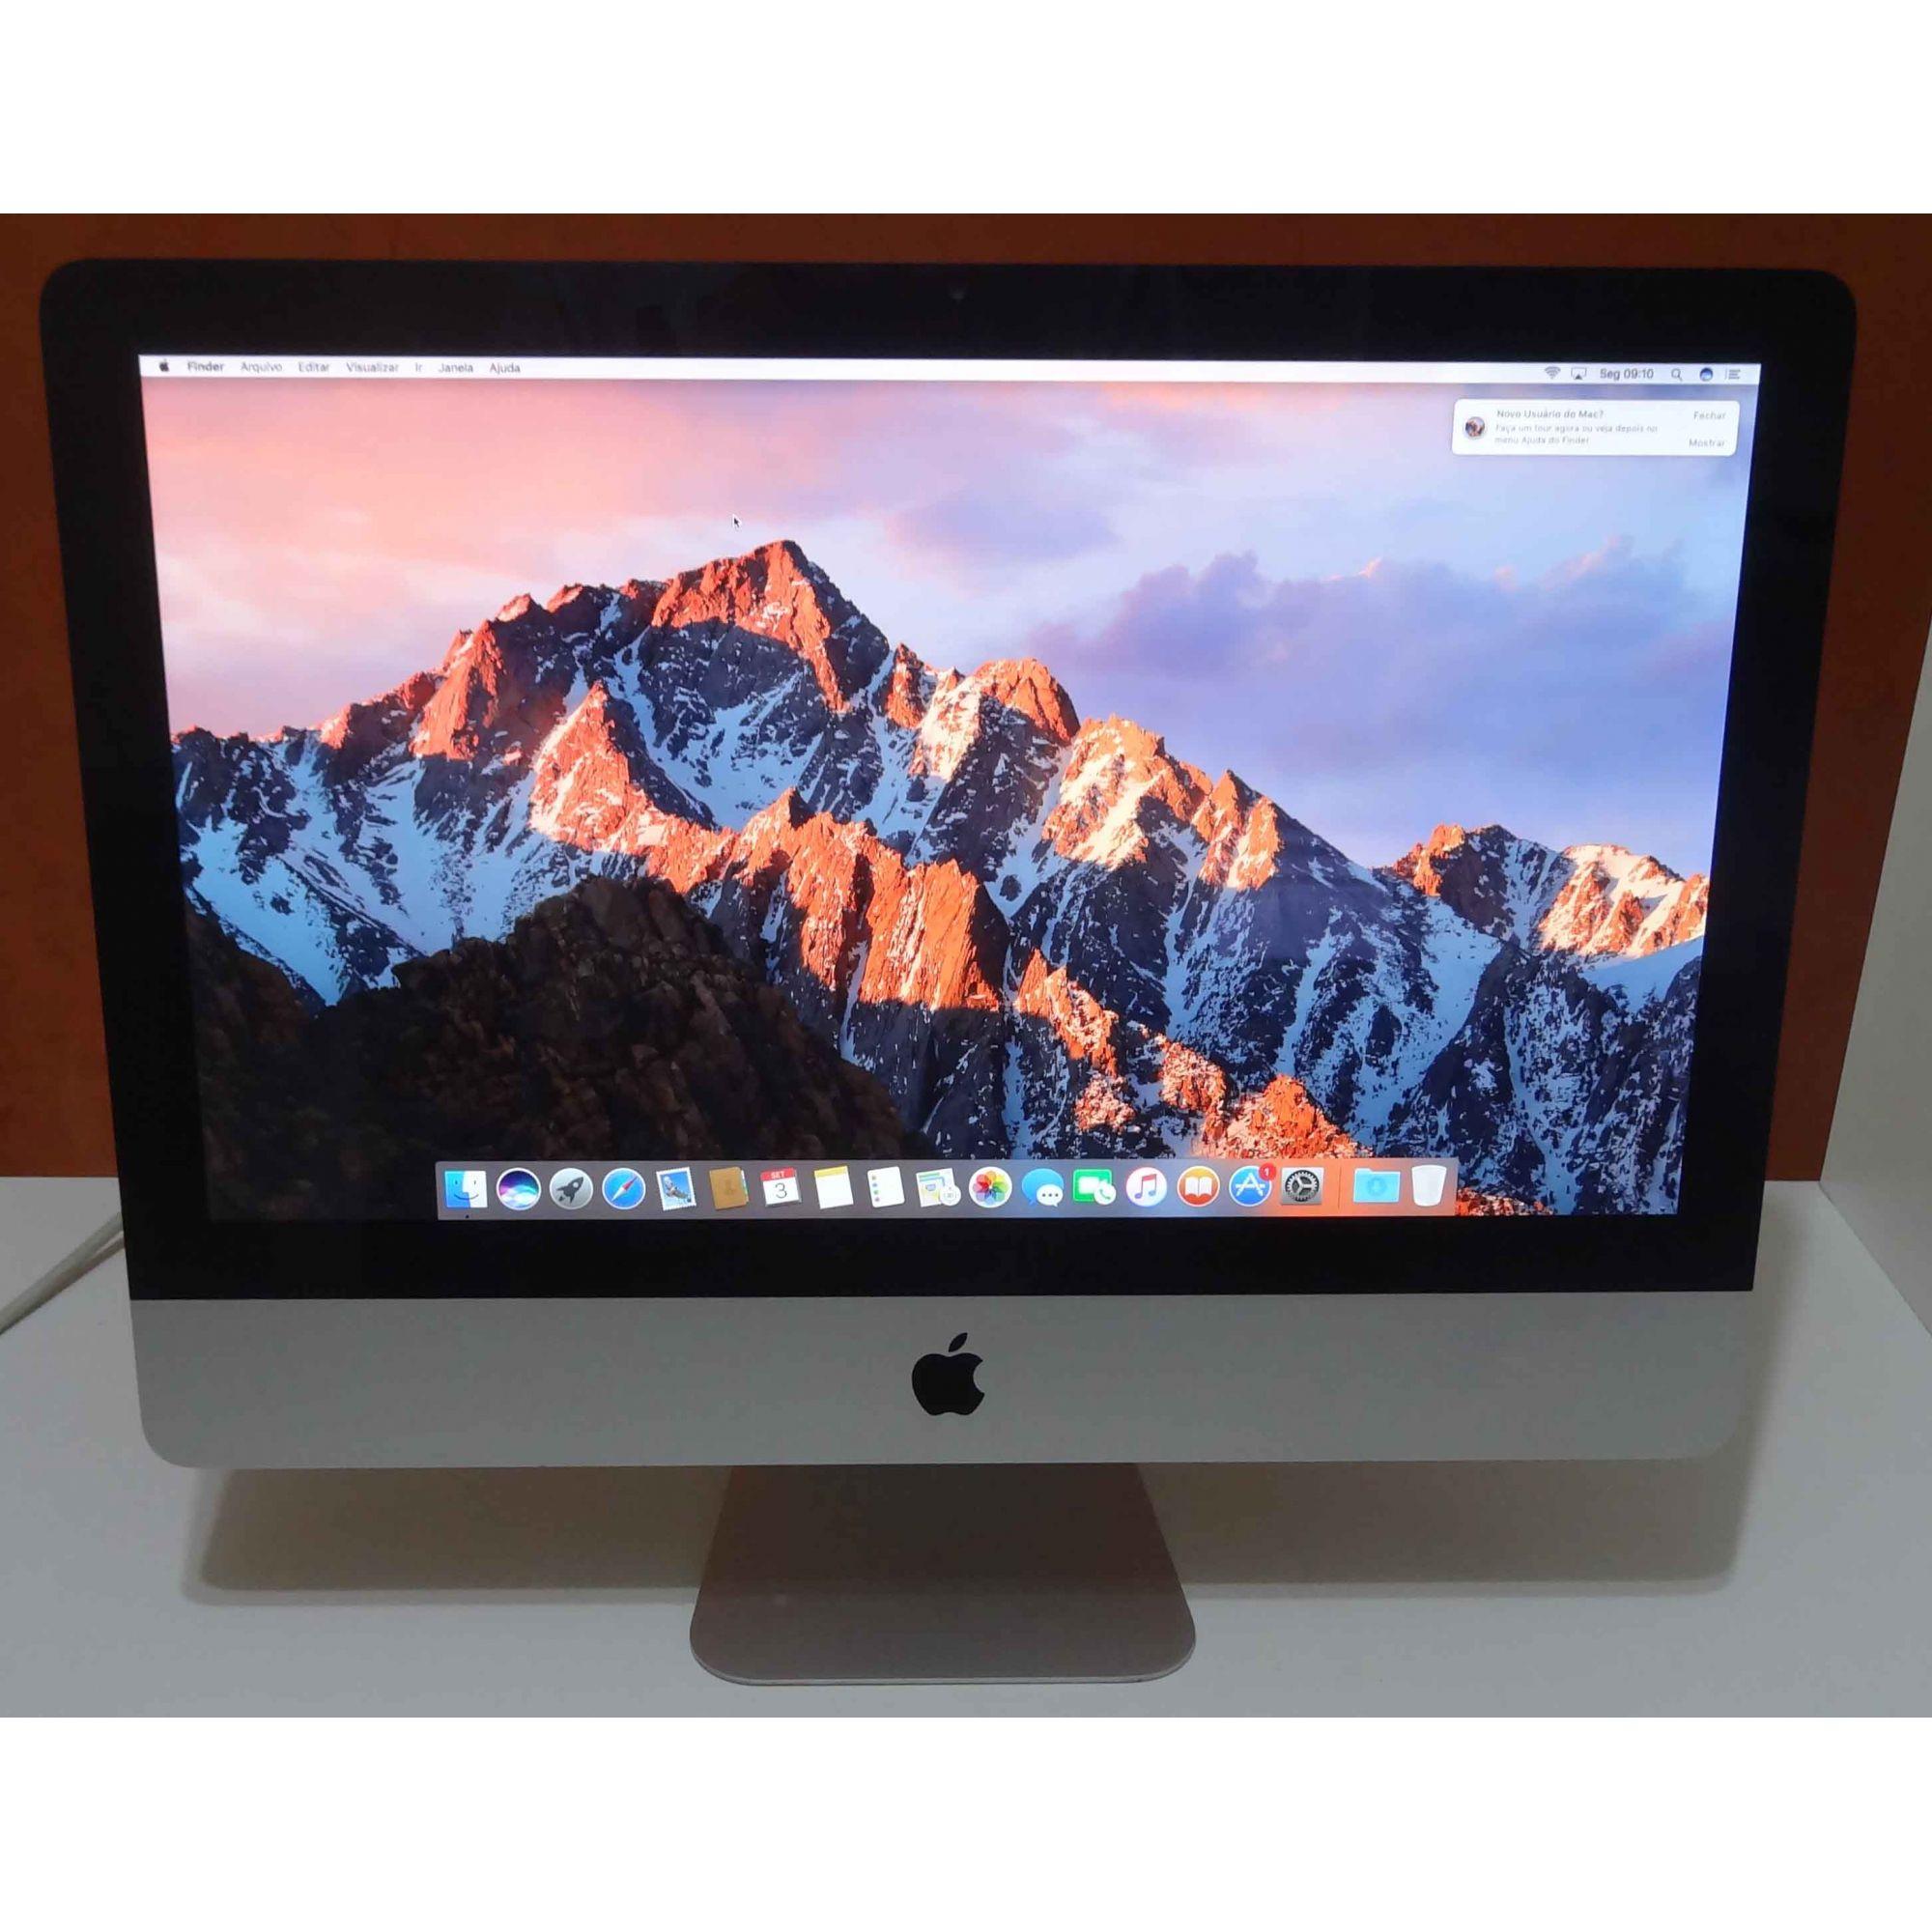 iMac MC309LL/A Intel Core i5 2.5GHz 4GB HD-500GB (NÃO ENVIAMOS)